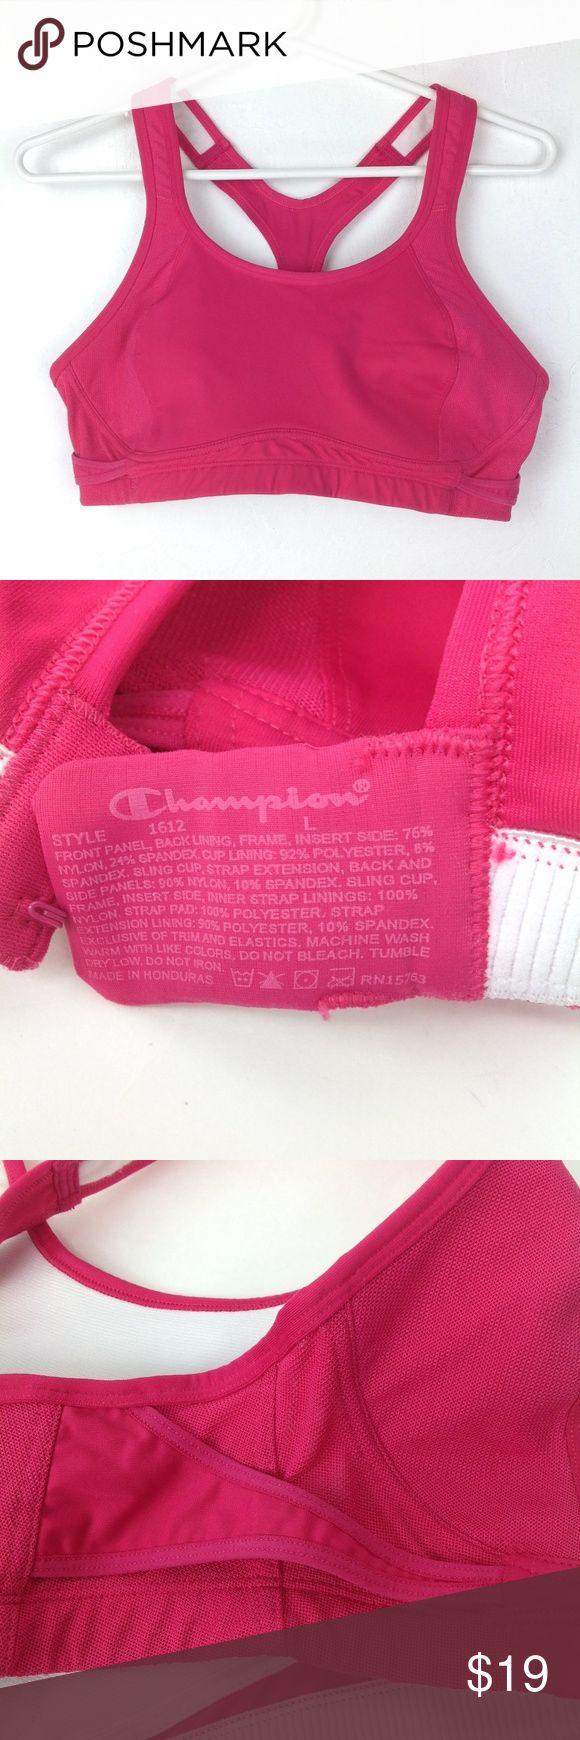 Hot pink Champion sports bra Champion sports bra, back clasp, size L Champion In…